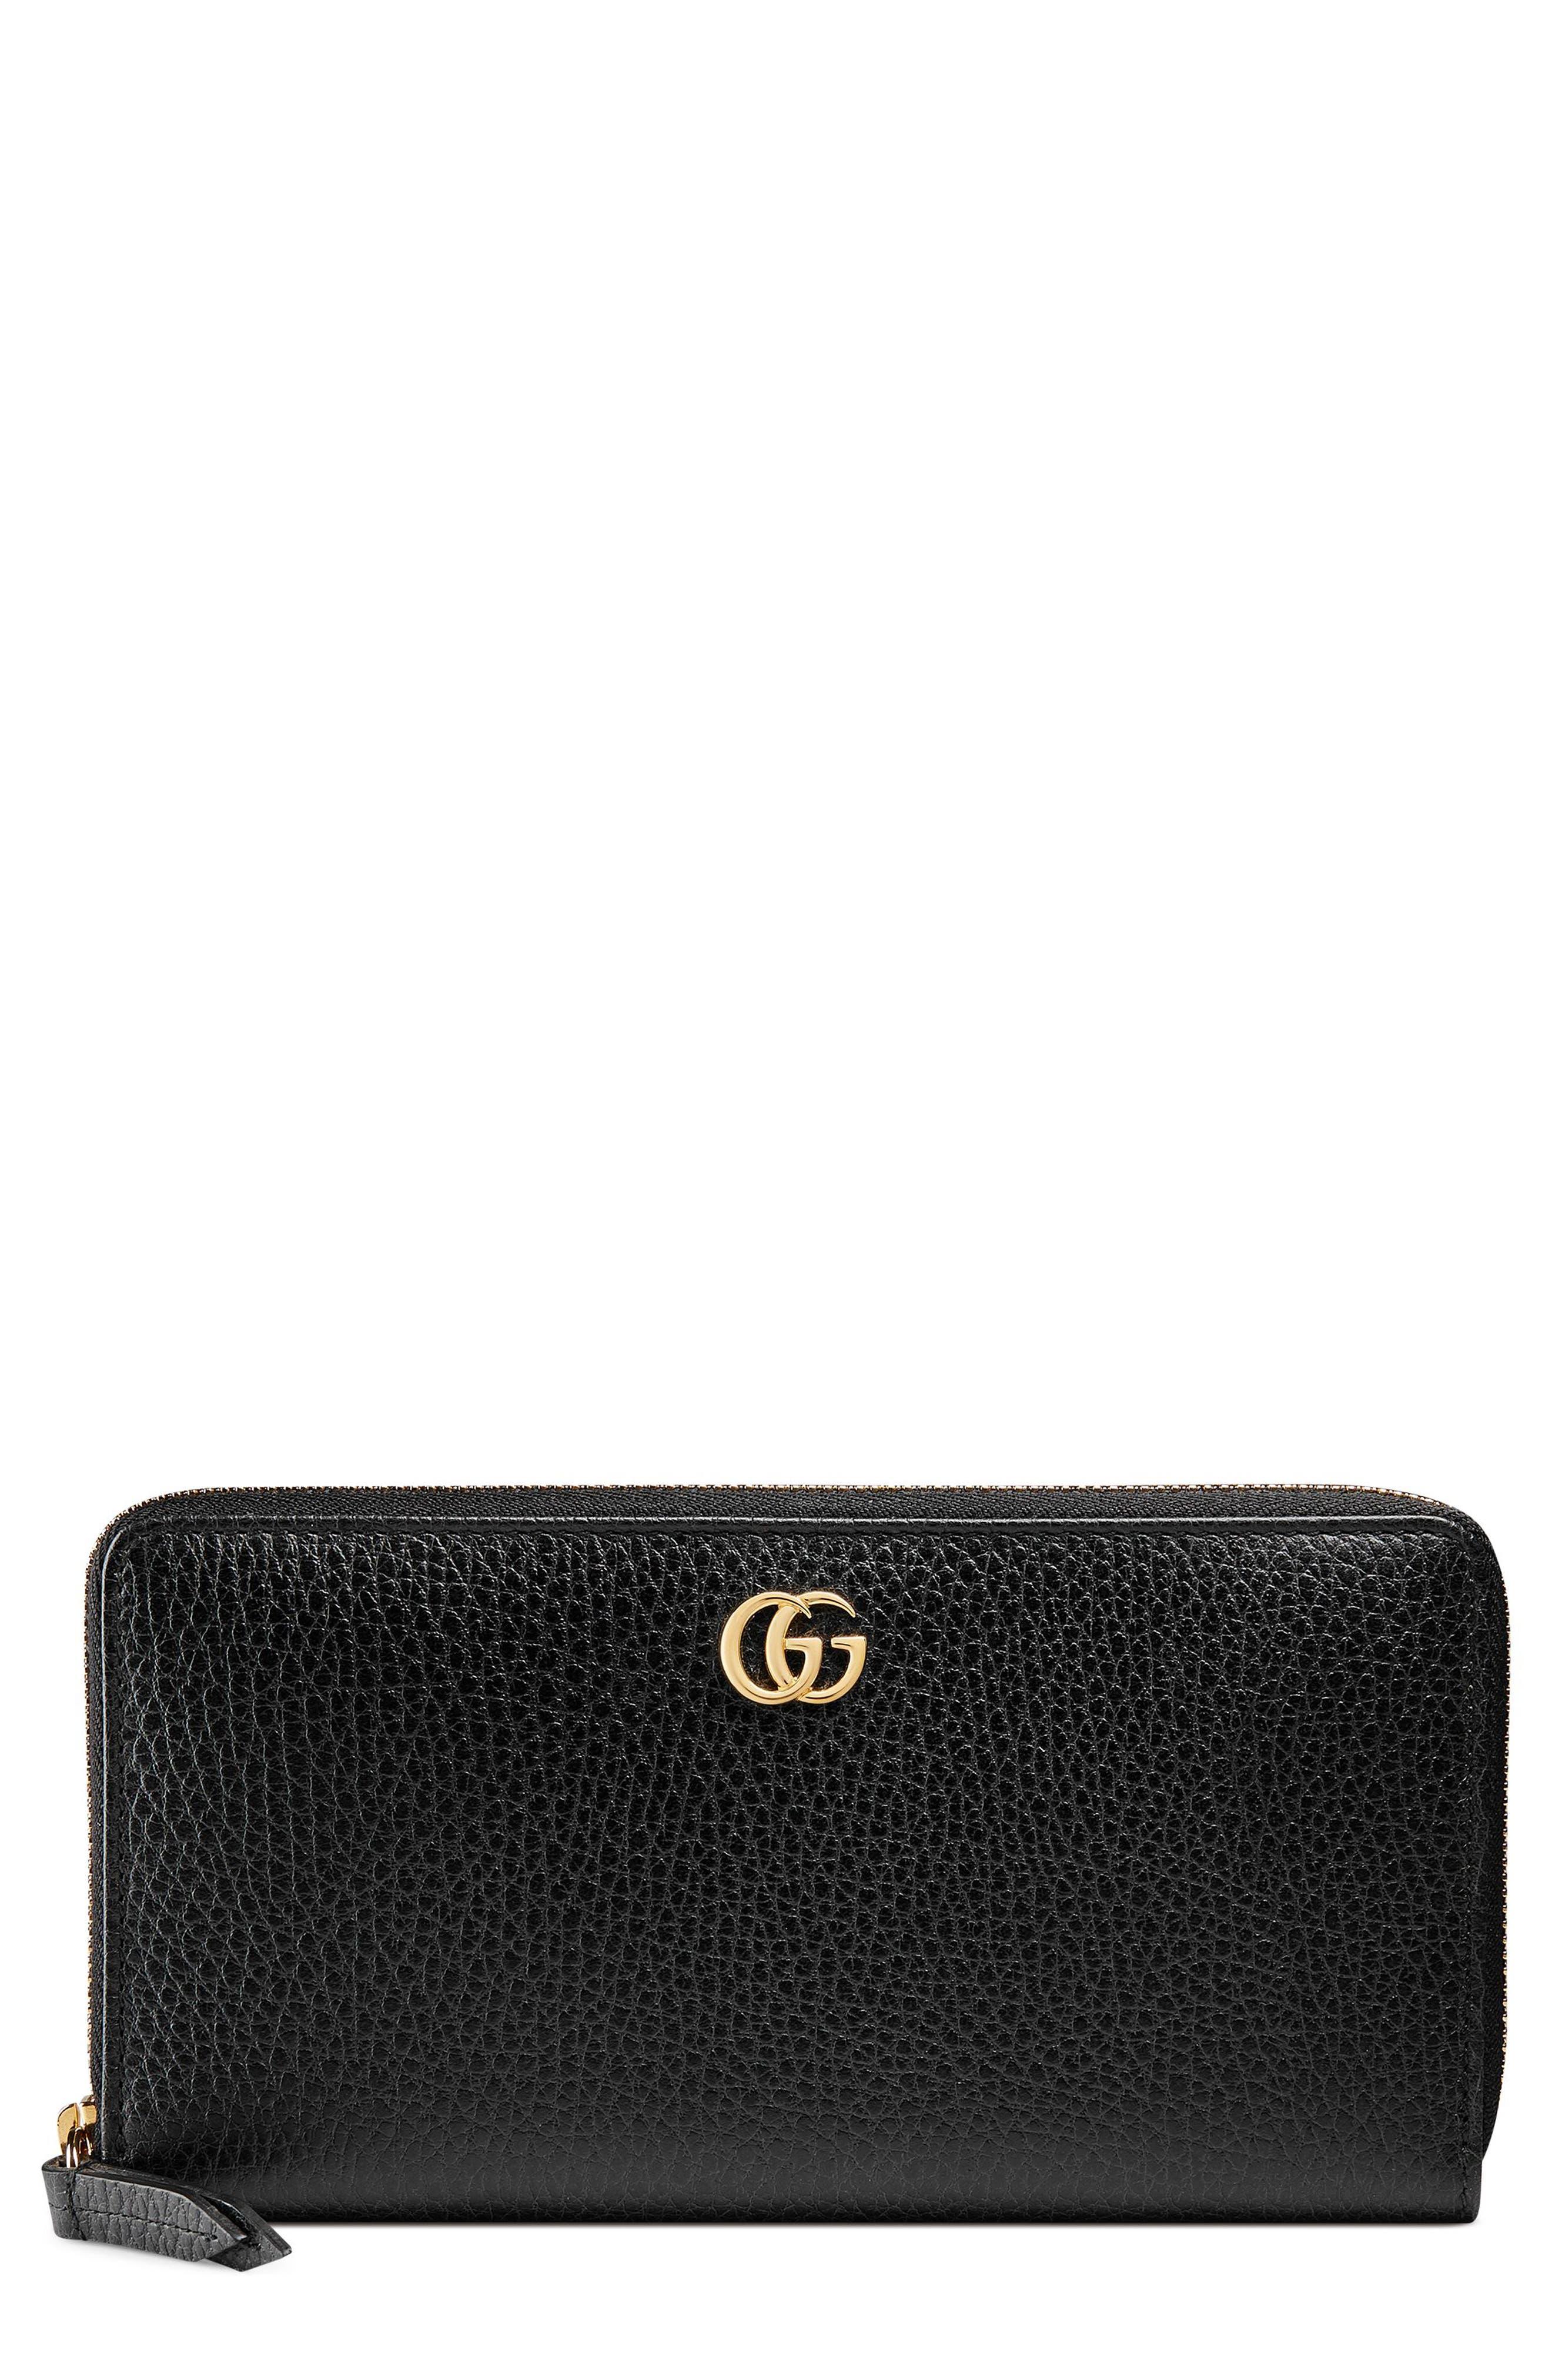 Petite Marmont Leather Zip Around Wallet,                             Main thumbnail 1, color,                             Nero/ Nero